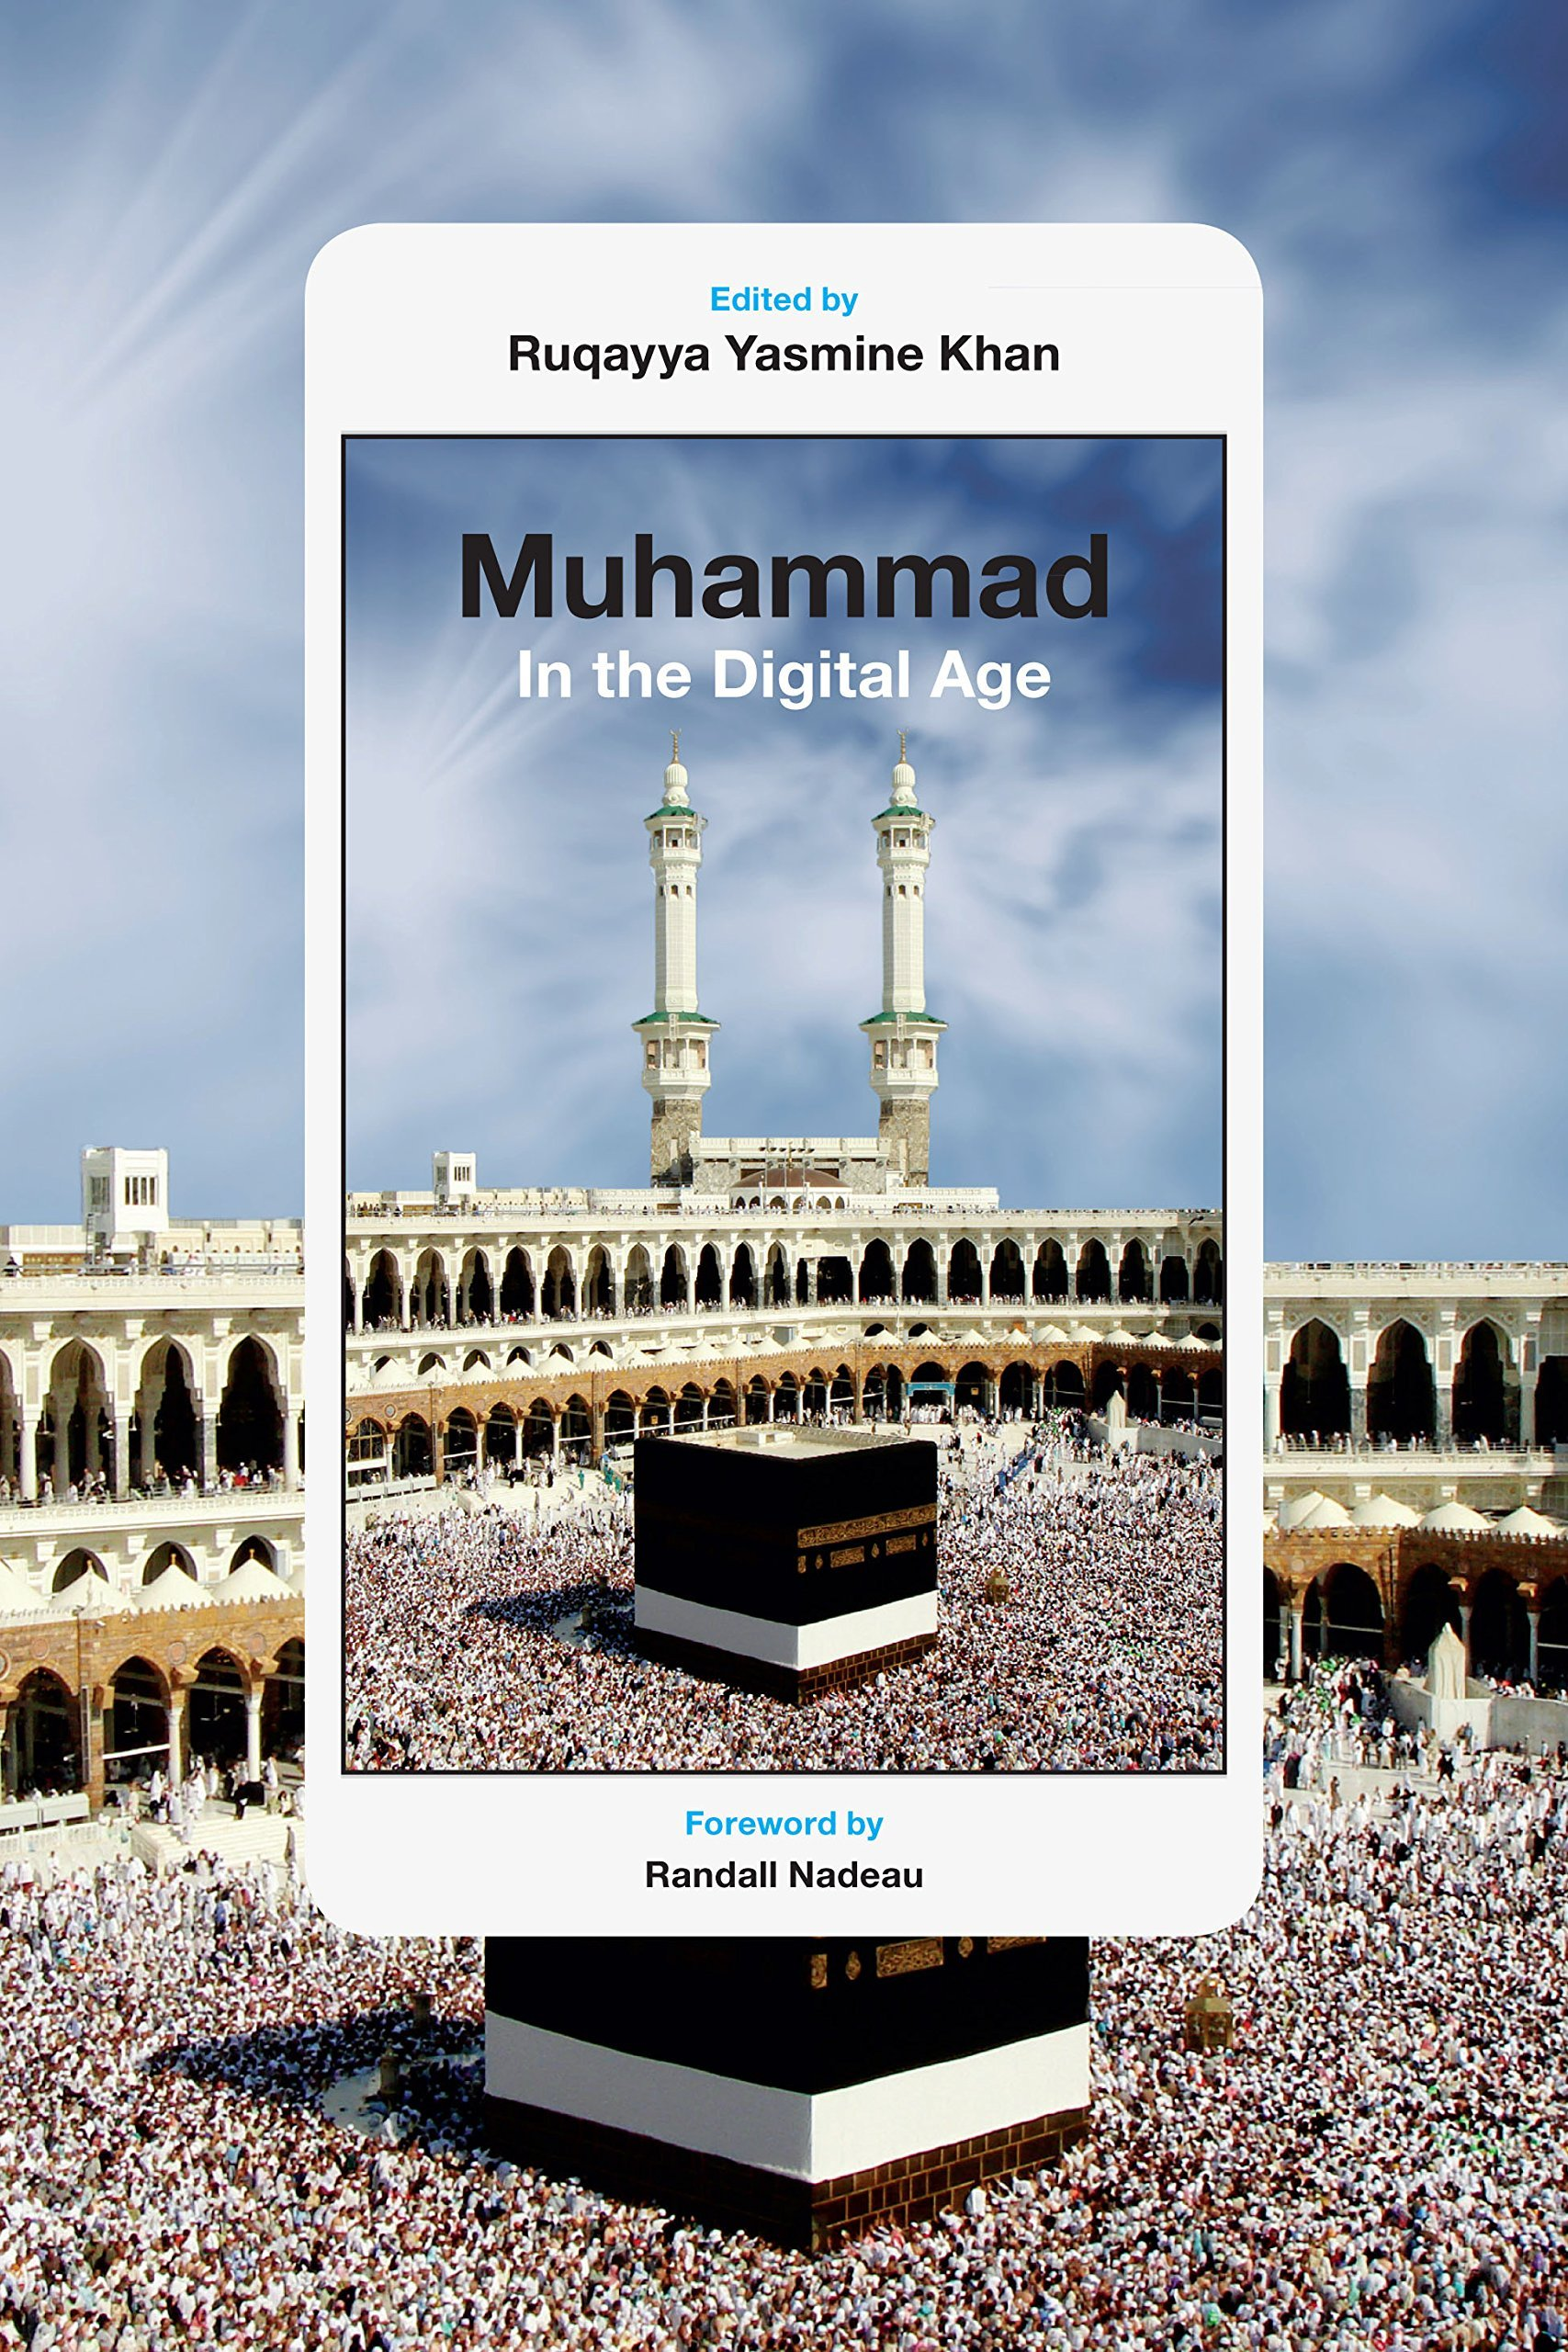 Muhammad in the Digital Age Ruqayya Yasmine Khan